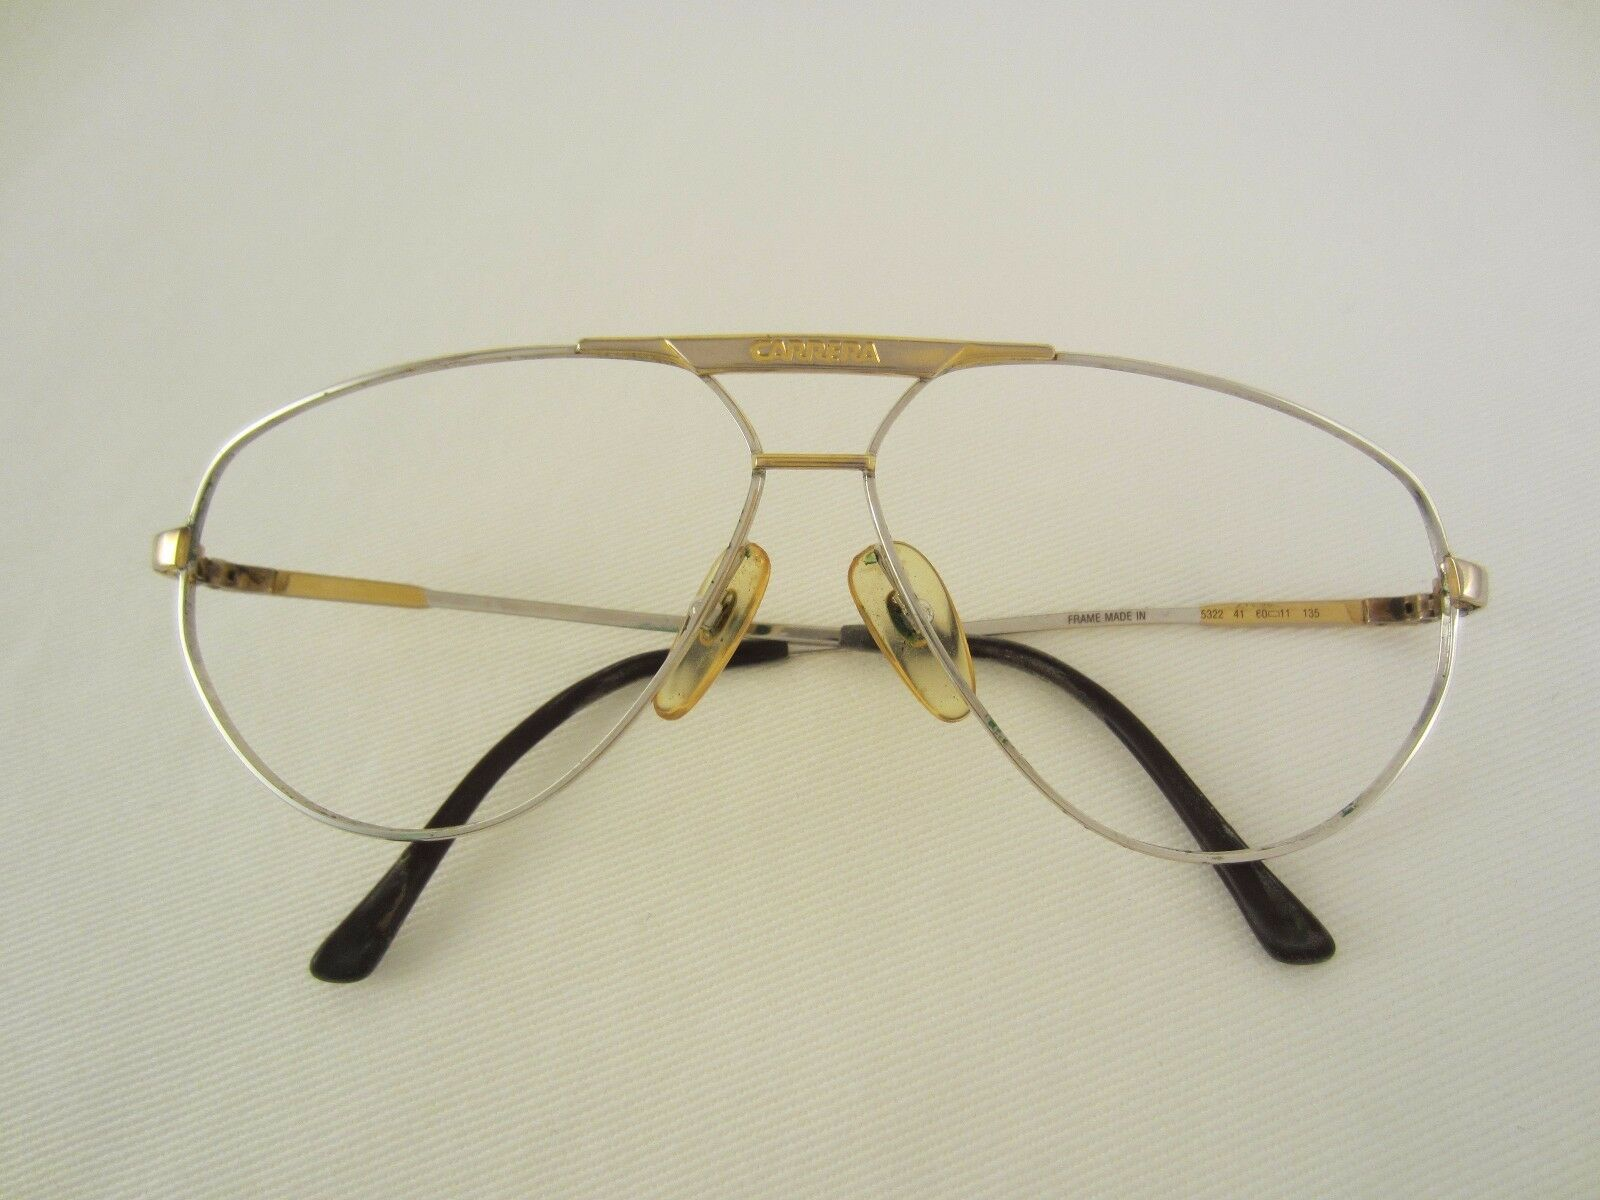 carrera brille 5322 brillengestell metall vintage aviator. Black Bedroom Furniture Sets. Home Design Ideas